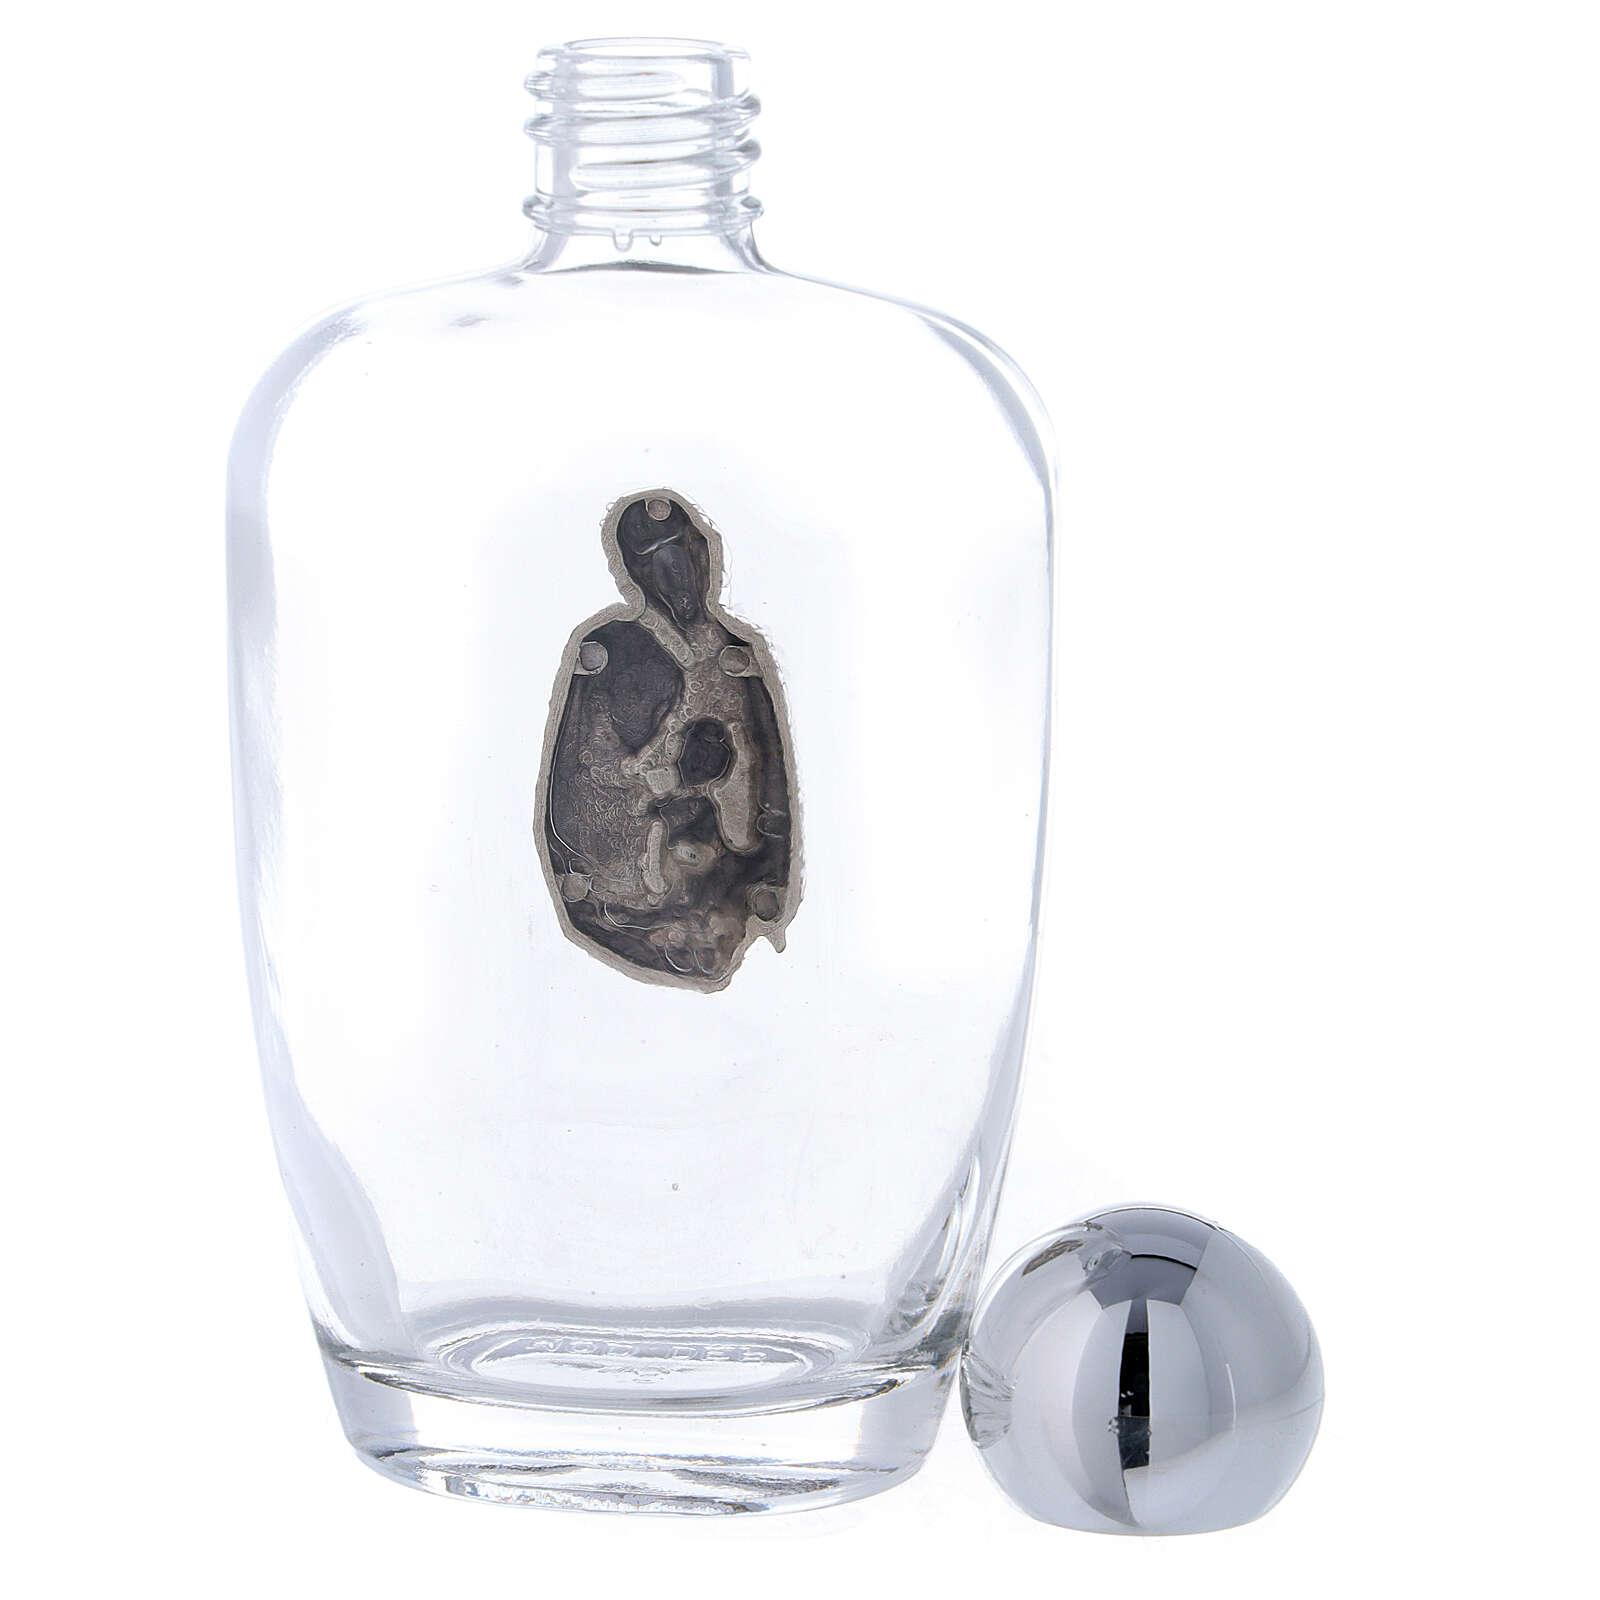 Bottiglietta Sacra Famiglia acquasanta 100 ml (CONF. 25 PZ) vetro 3